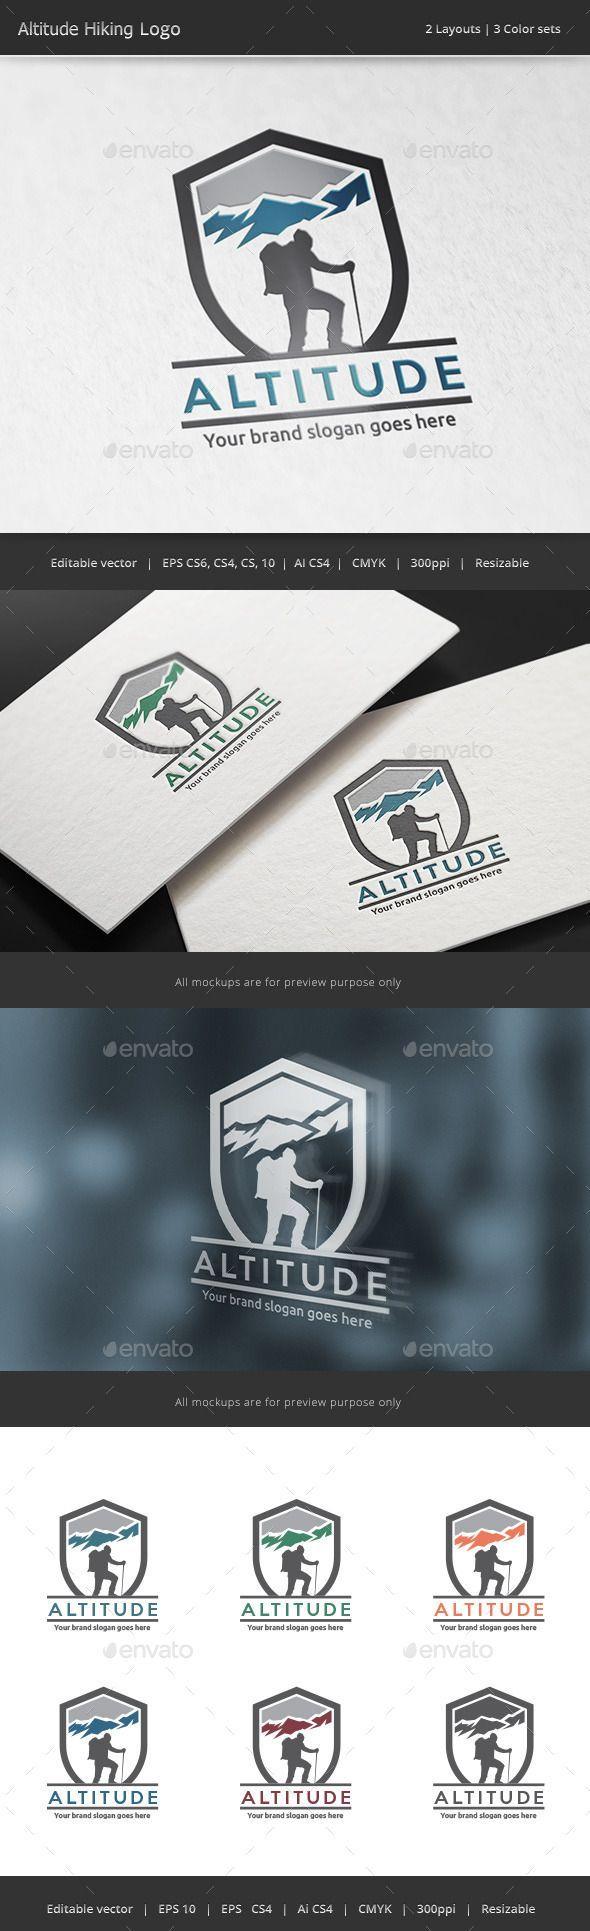 Altitude Trekking Logo by WheelieMonkey Files format : EPS 10, EPS CS, EPS CS4, EPS CS6, AI CS4 Color mode : CMYK Resolution : 300PPI Resizable Free font used: keep